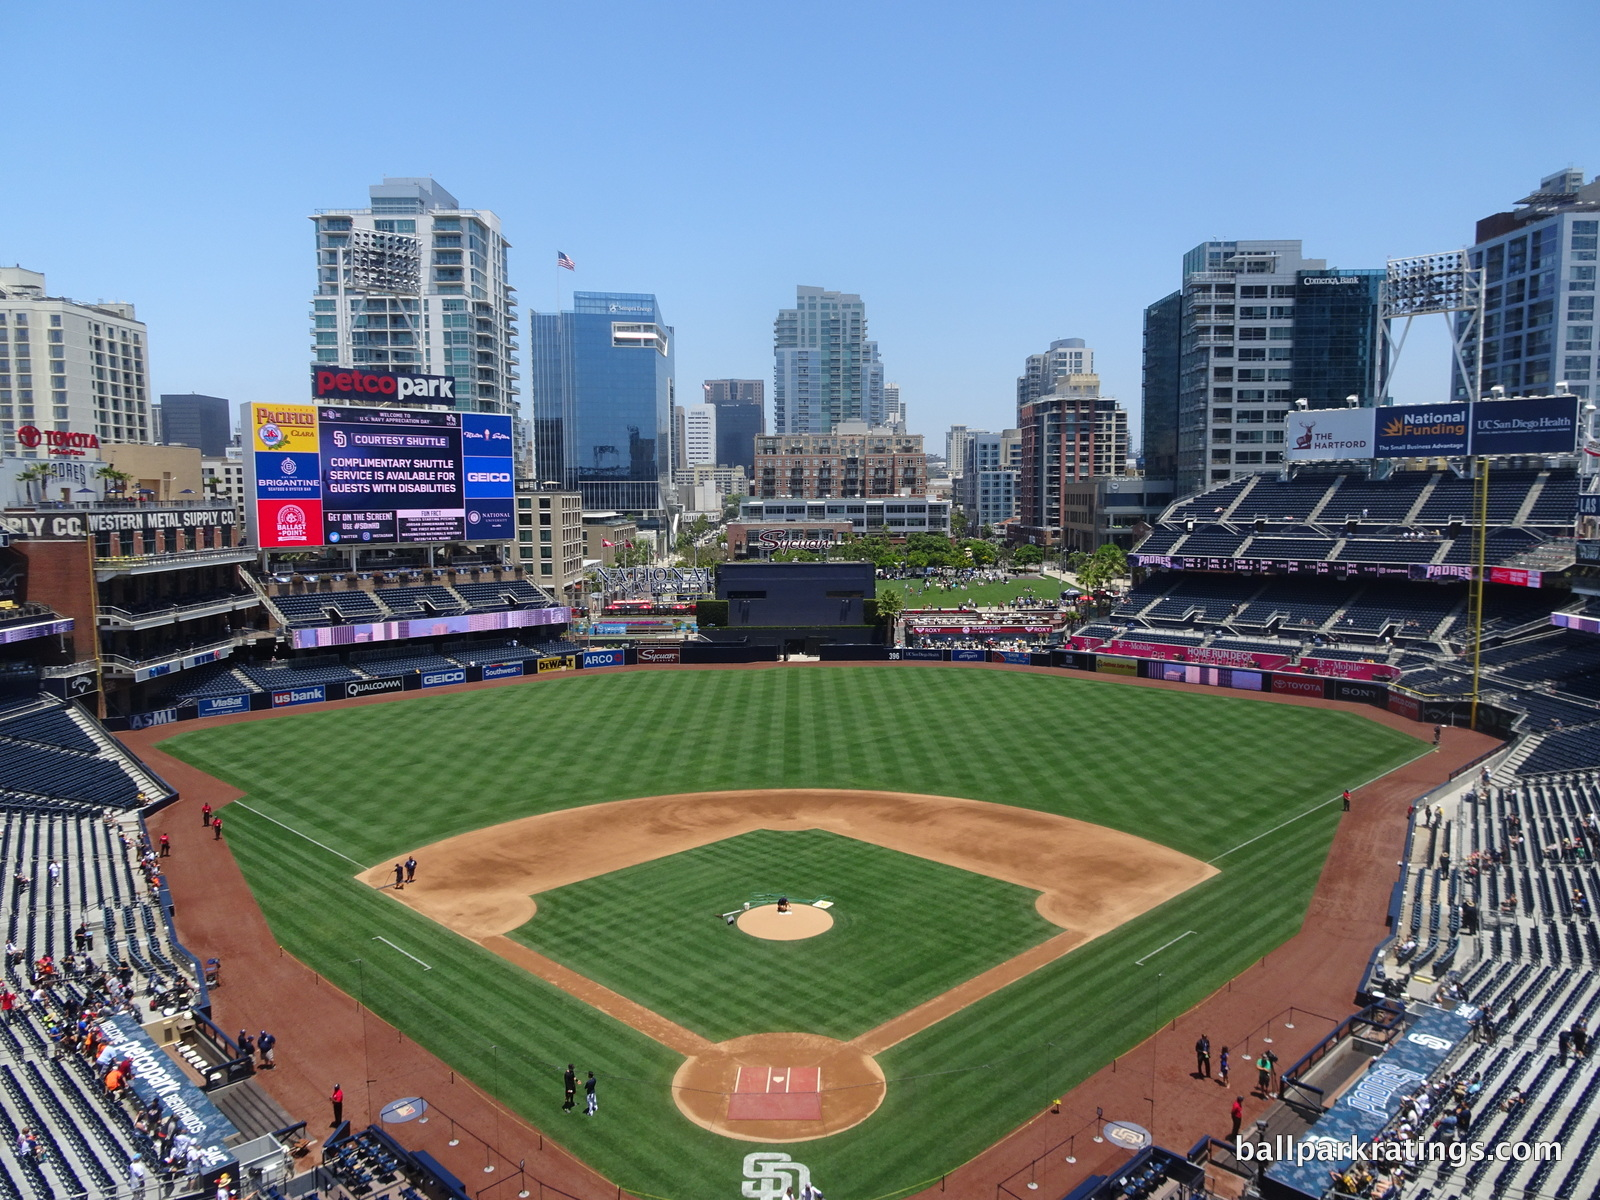 Petco Park Best Park in Baseball